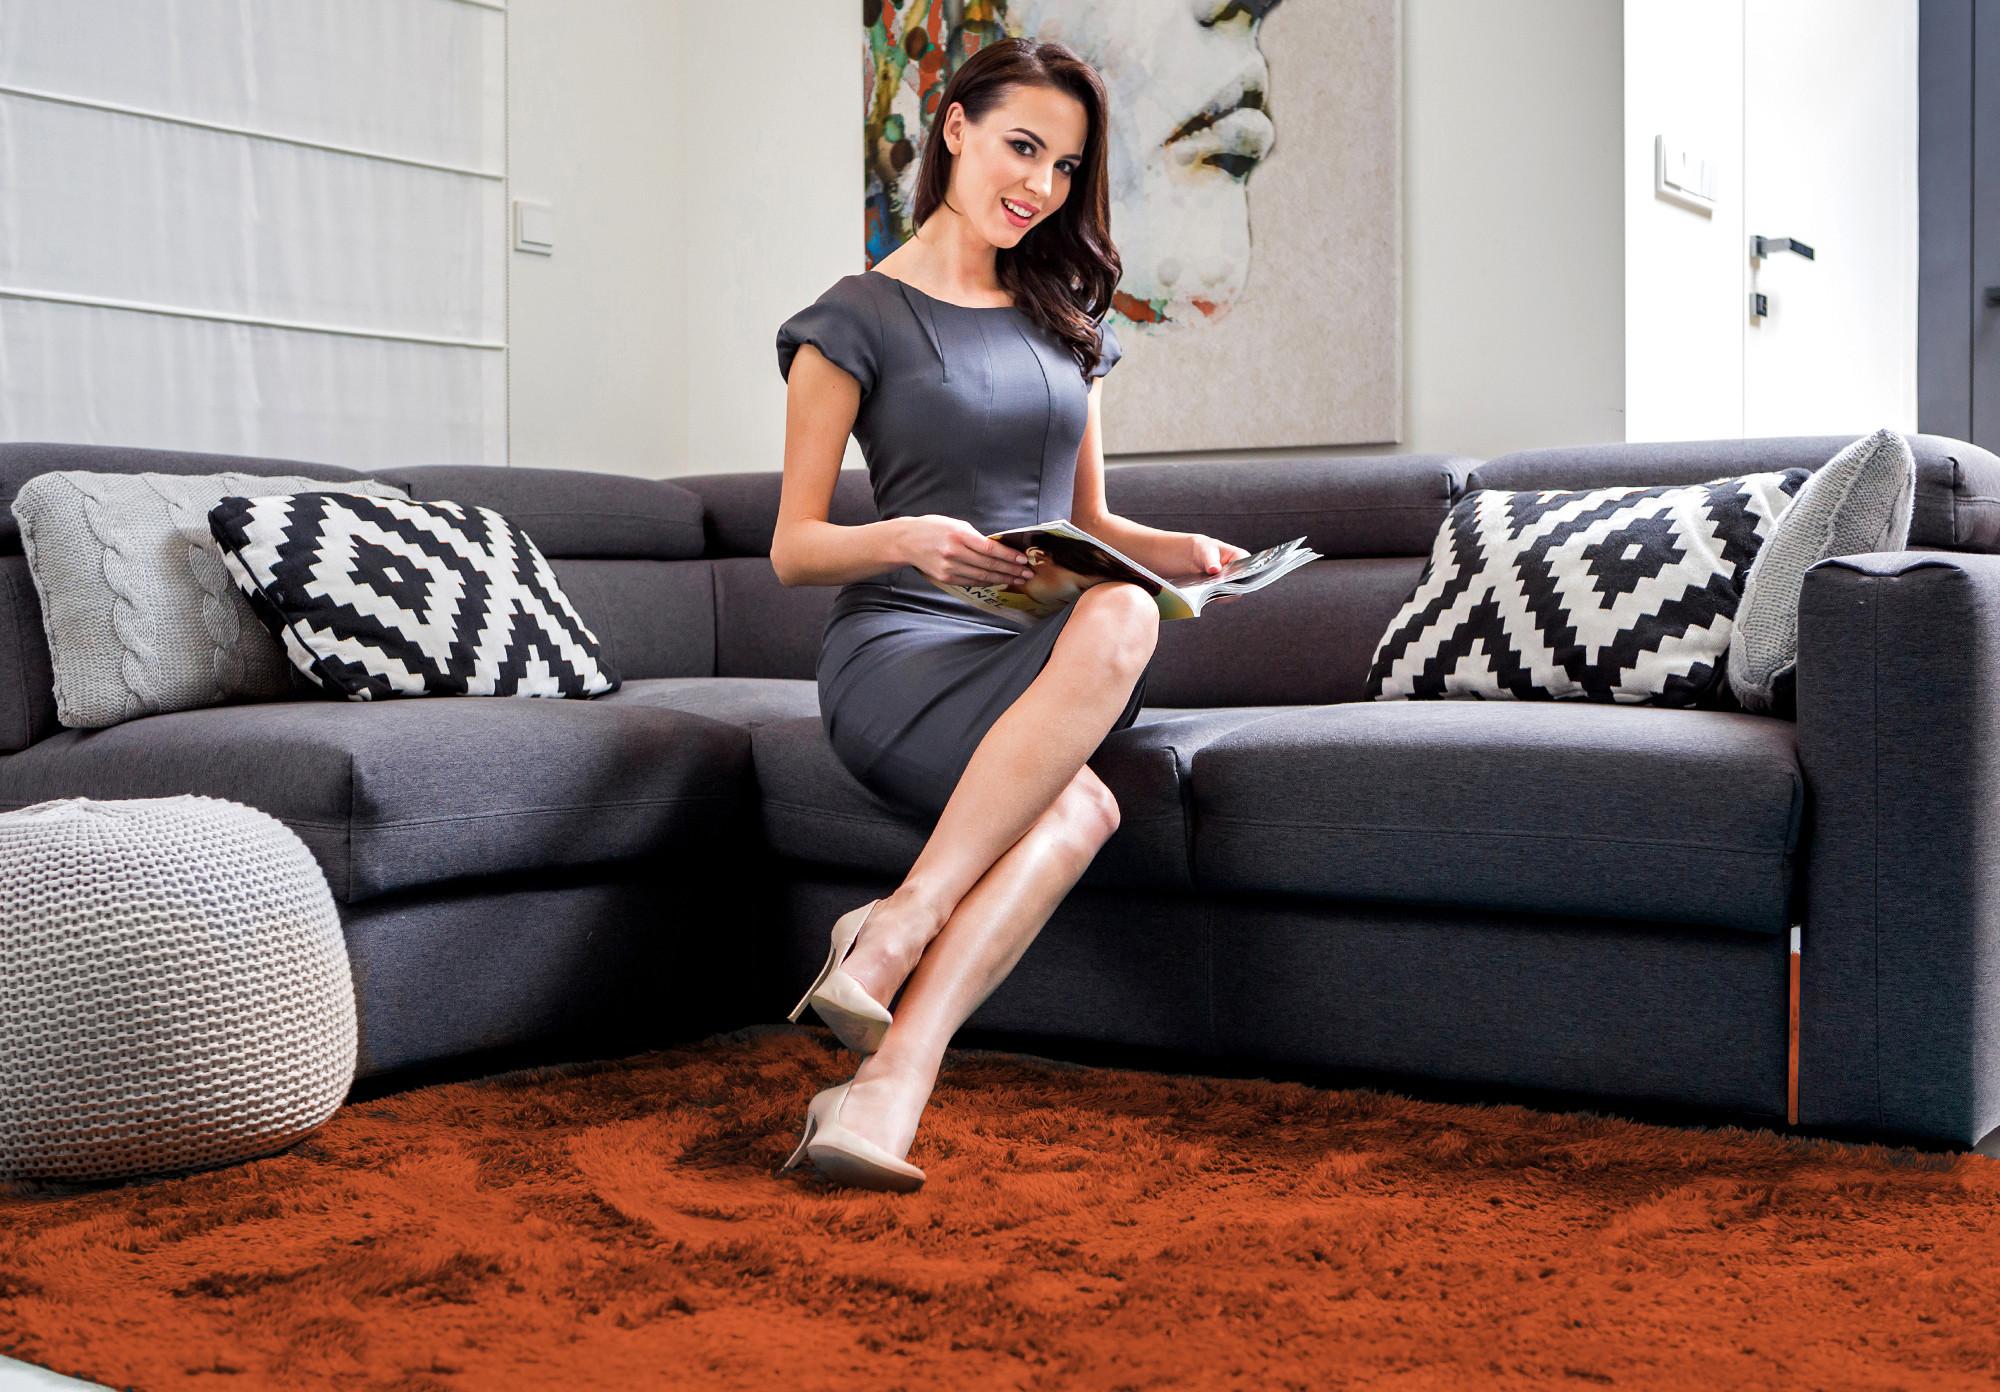 Luxusní hebký koberec hnědé barvy 120x170 cm